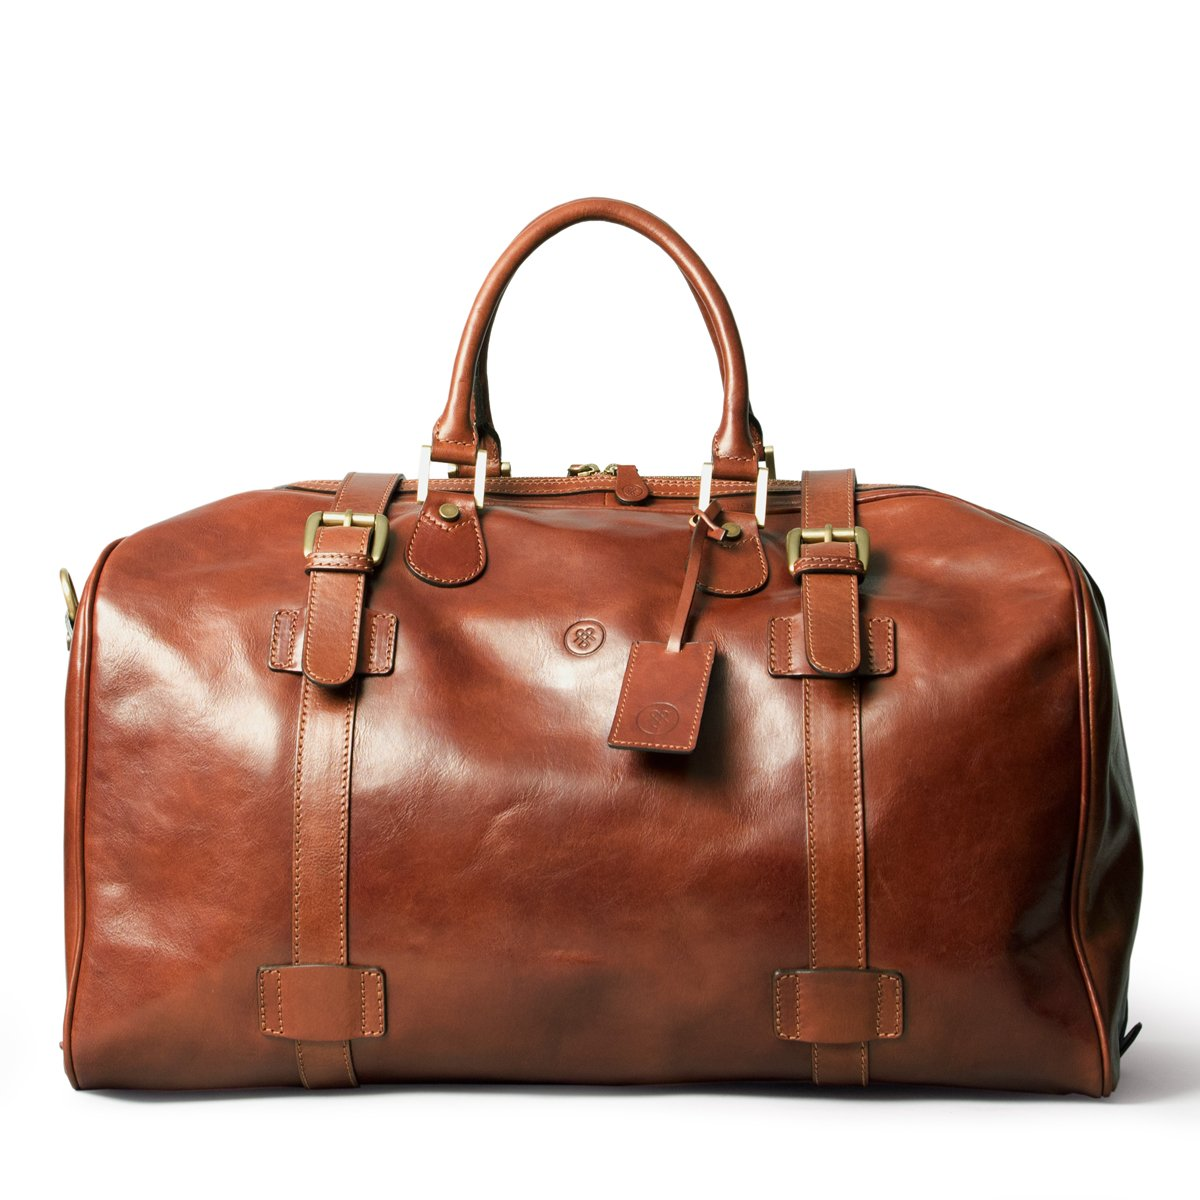 Maxwell Scott® Personalised Luxury Tan Leather Suitcase (The FleroL) - Large